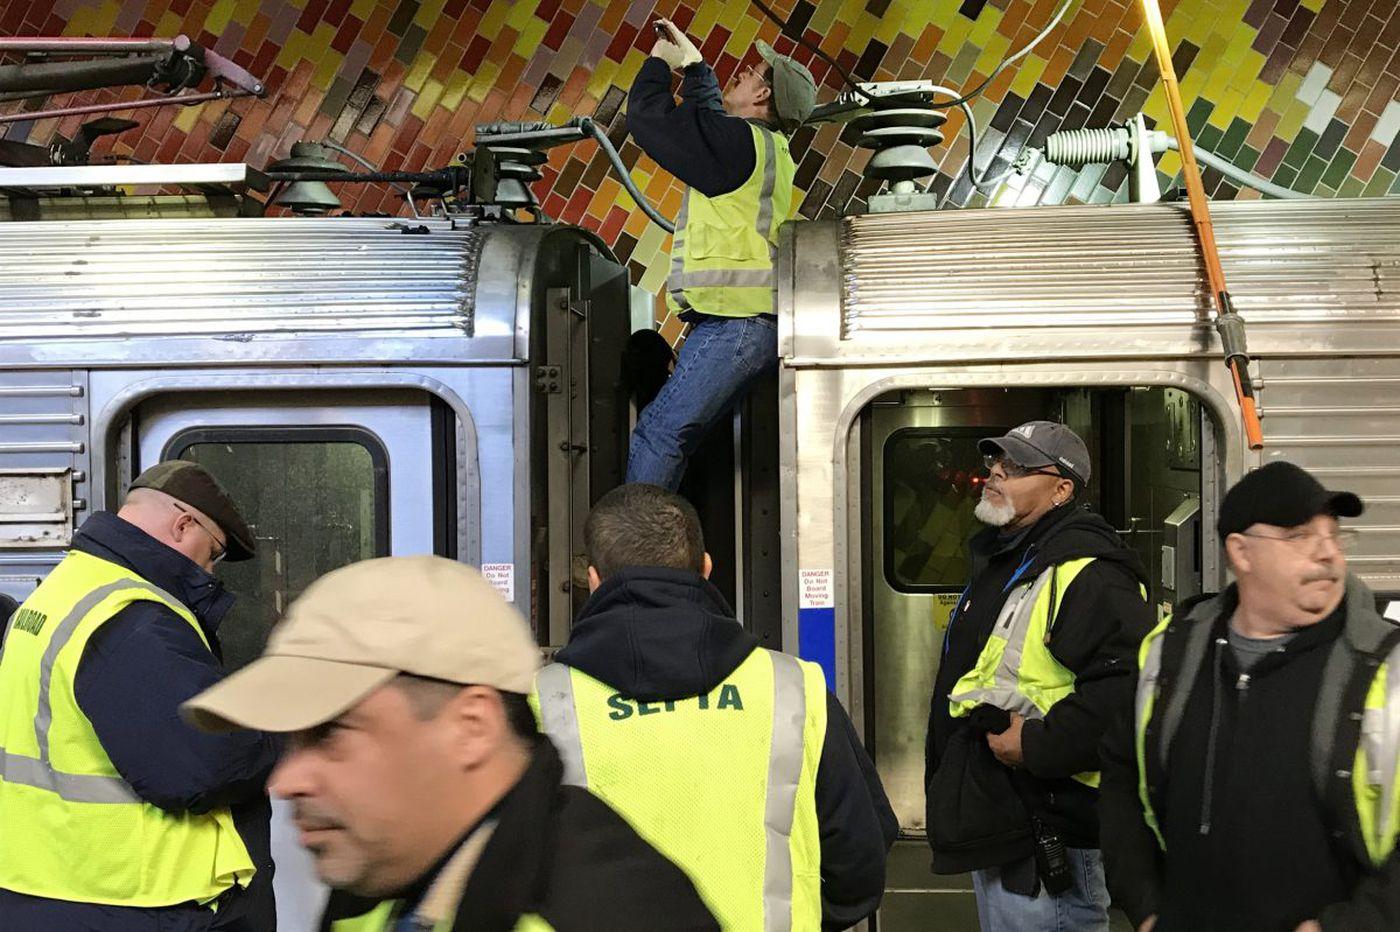 Burned body found atop SEPTA train identified as Philadelphia teen